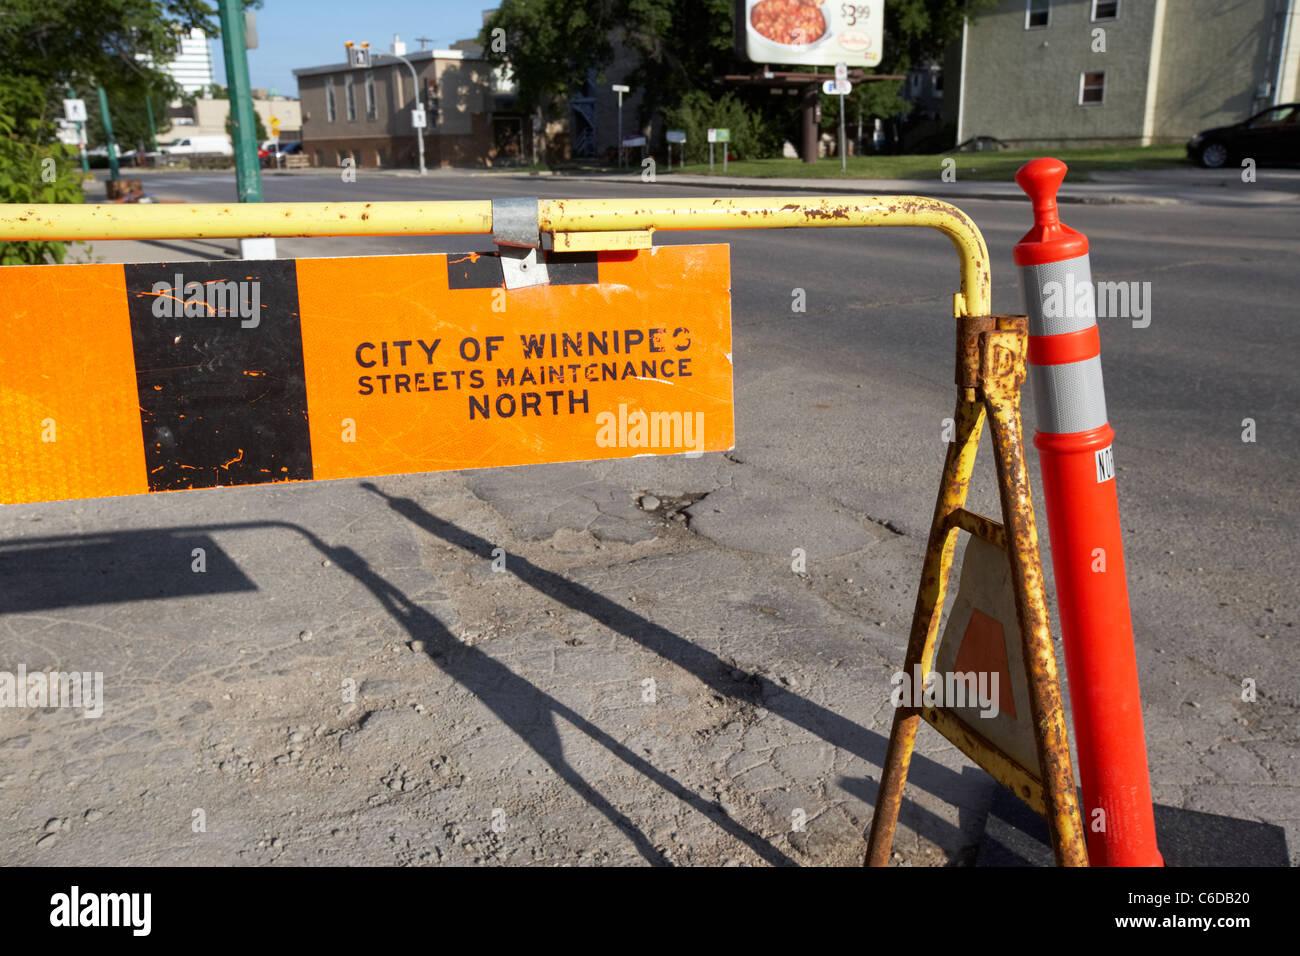 city of winnipeg streets maintenance broken sidewalk road barrier safety manitoba canada - Stock Image